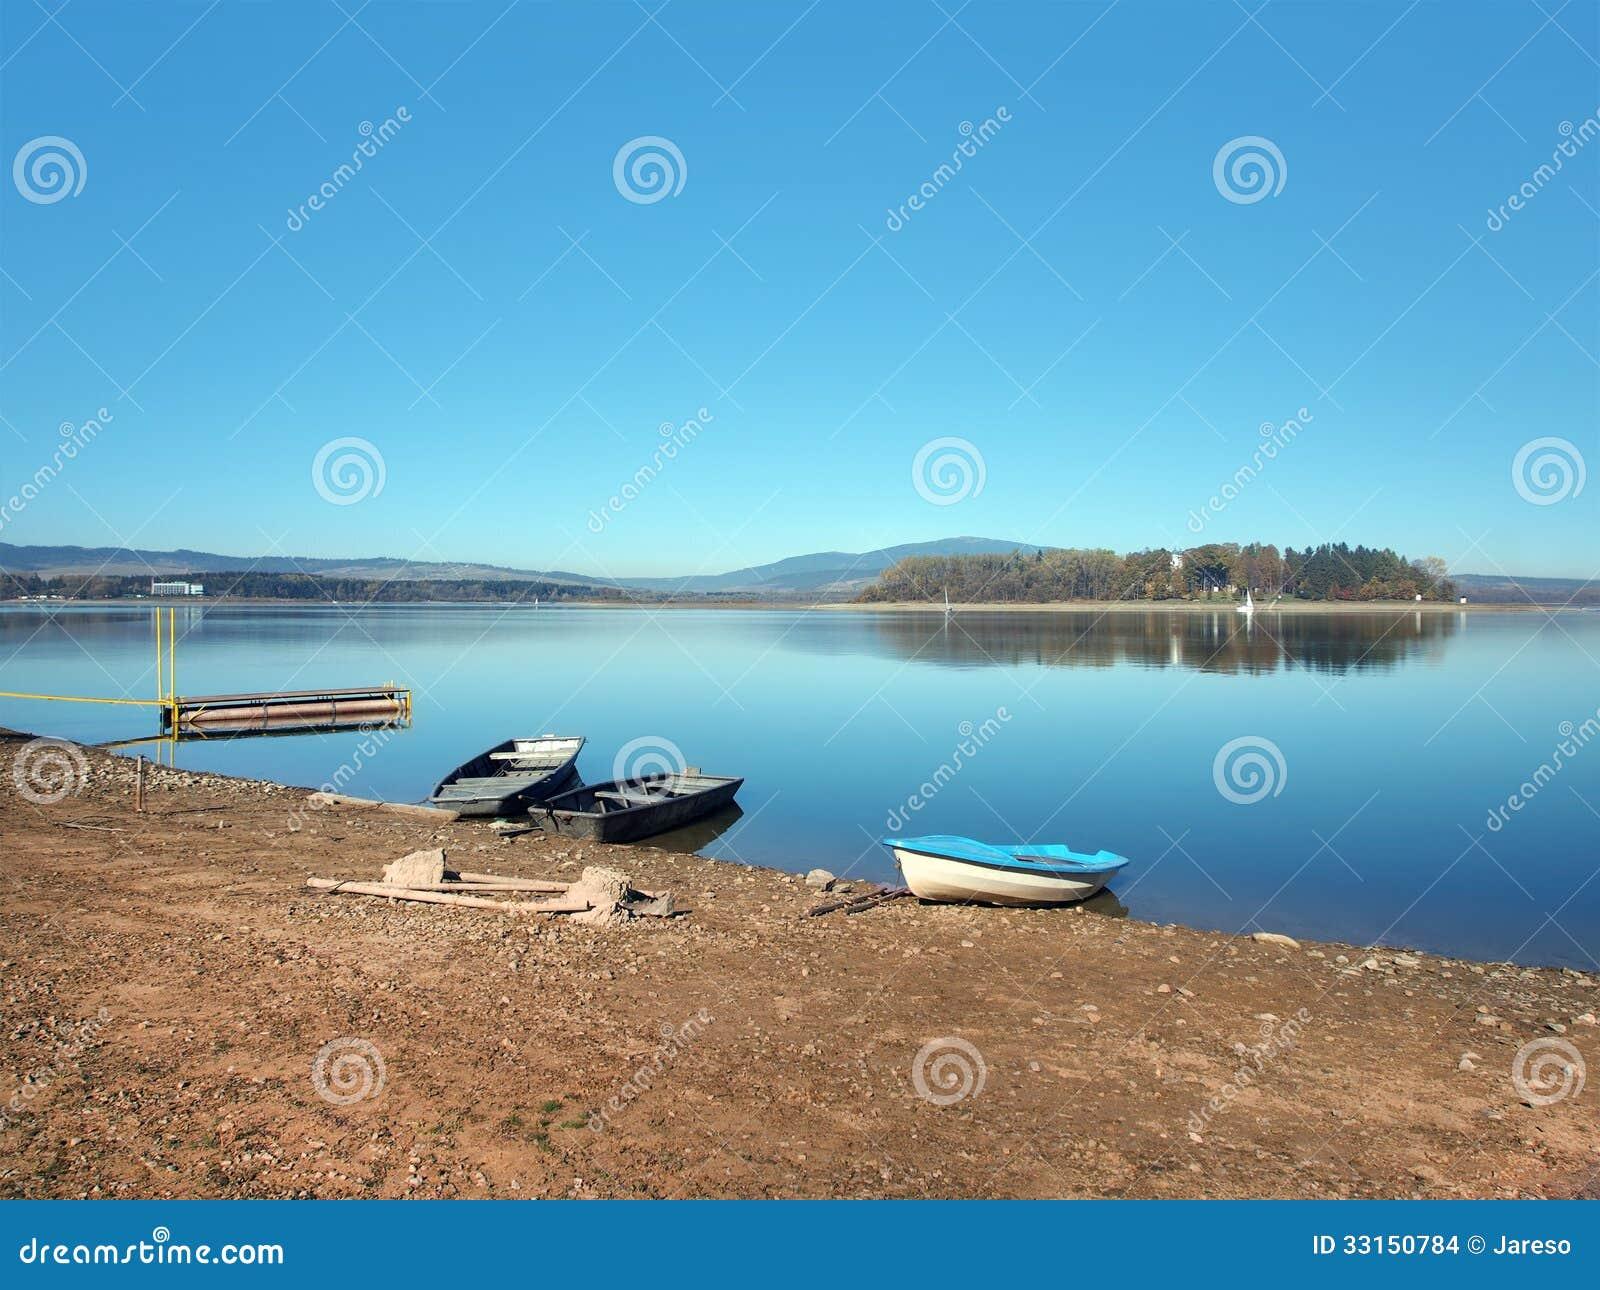 Shore, boats and Slanica Island